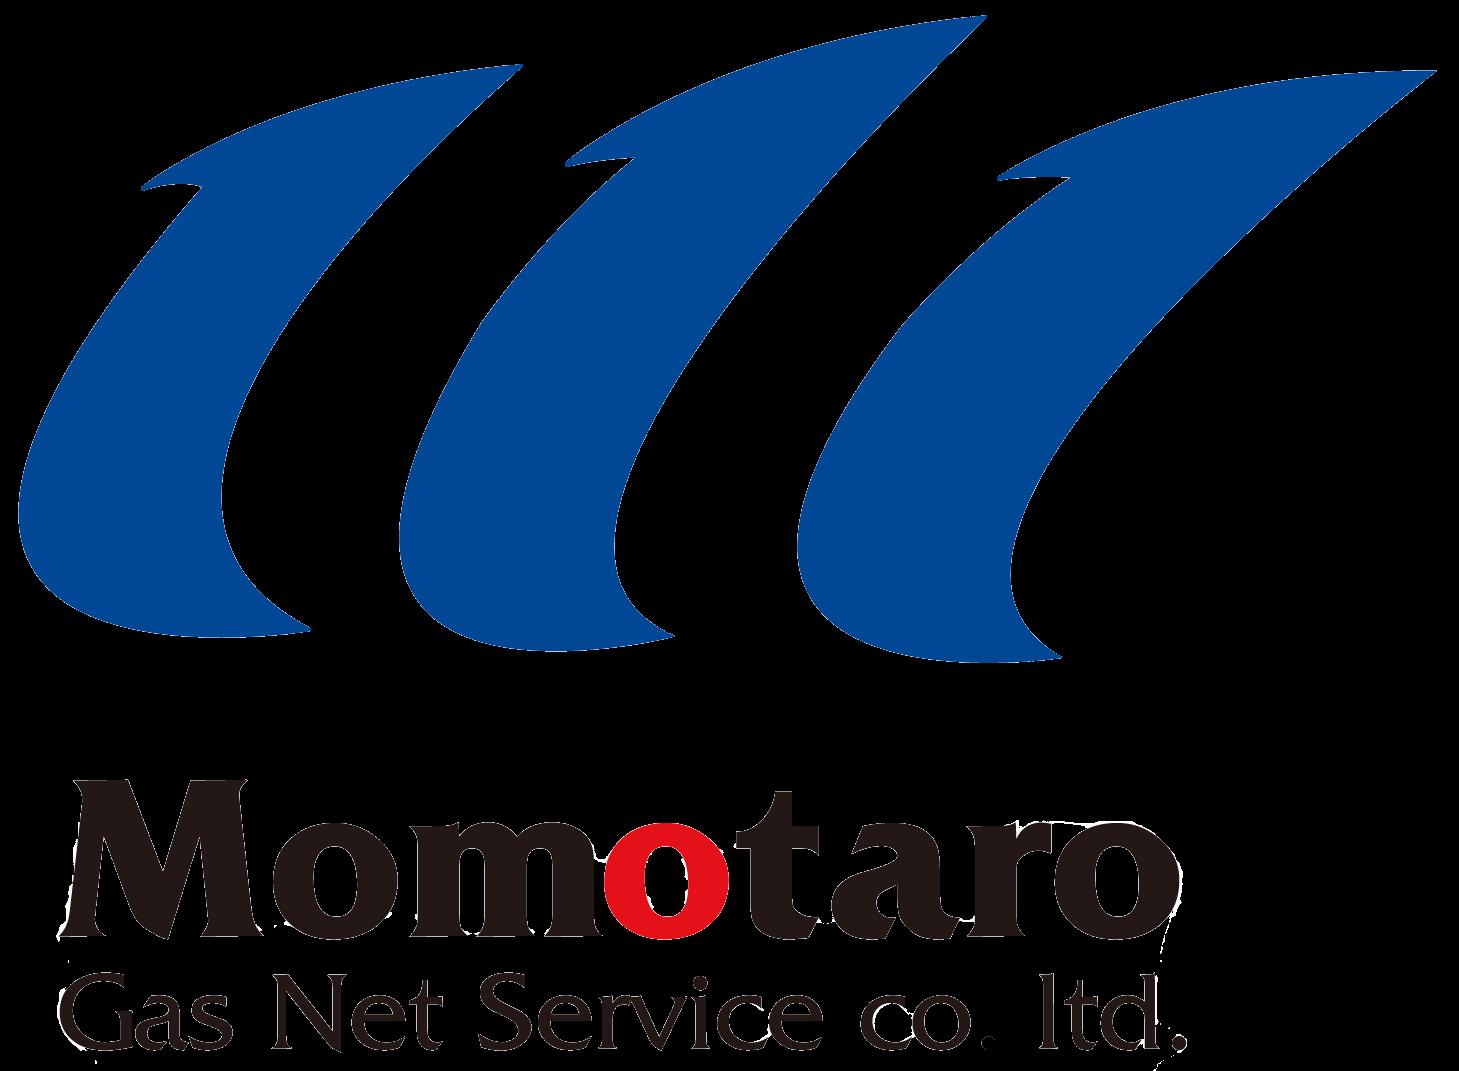 logo-mark-tp